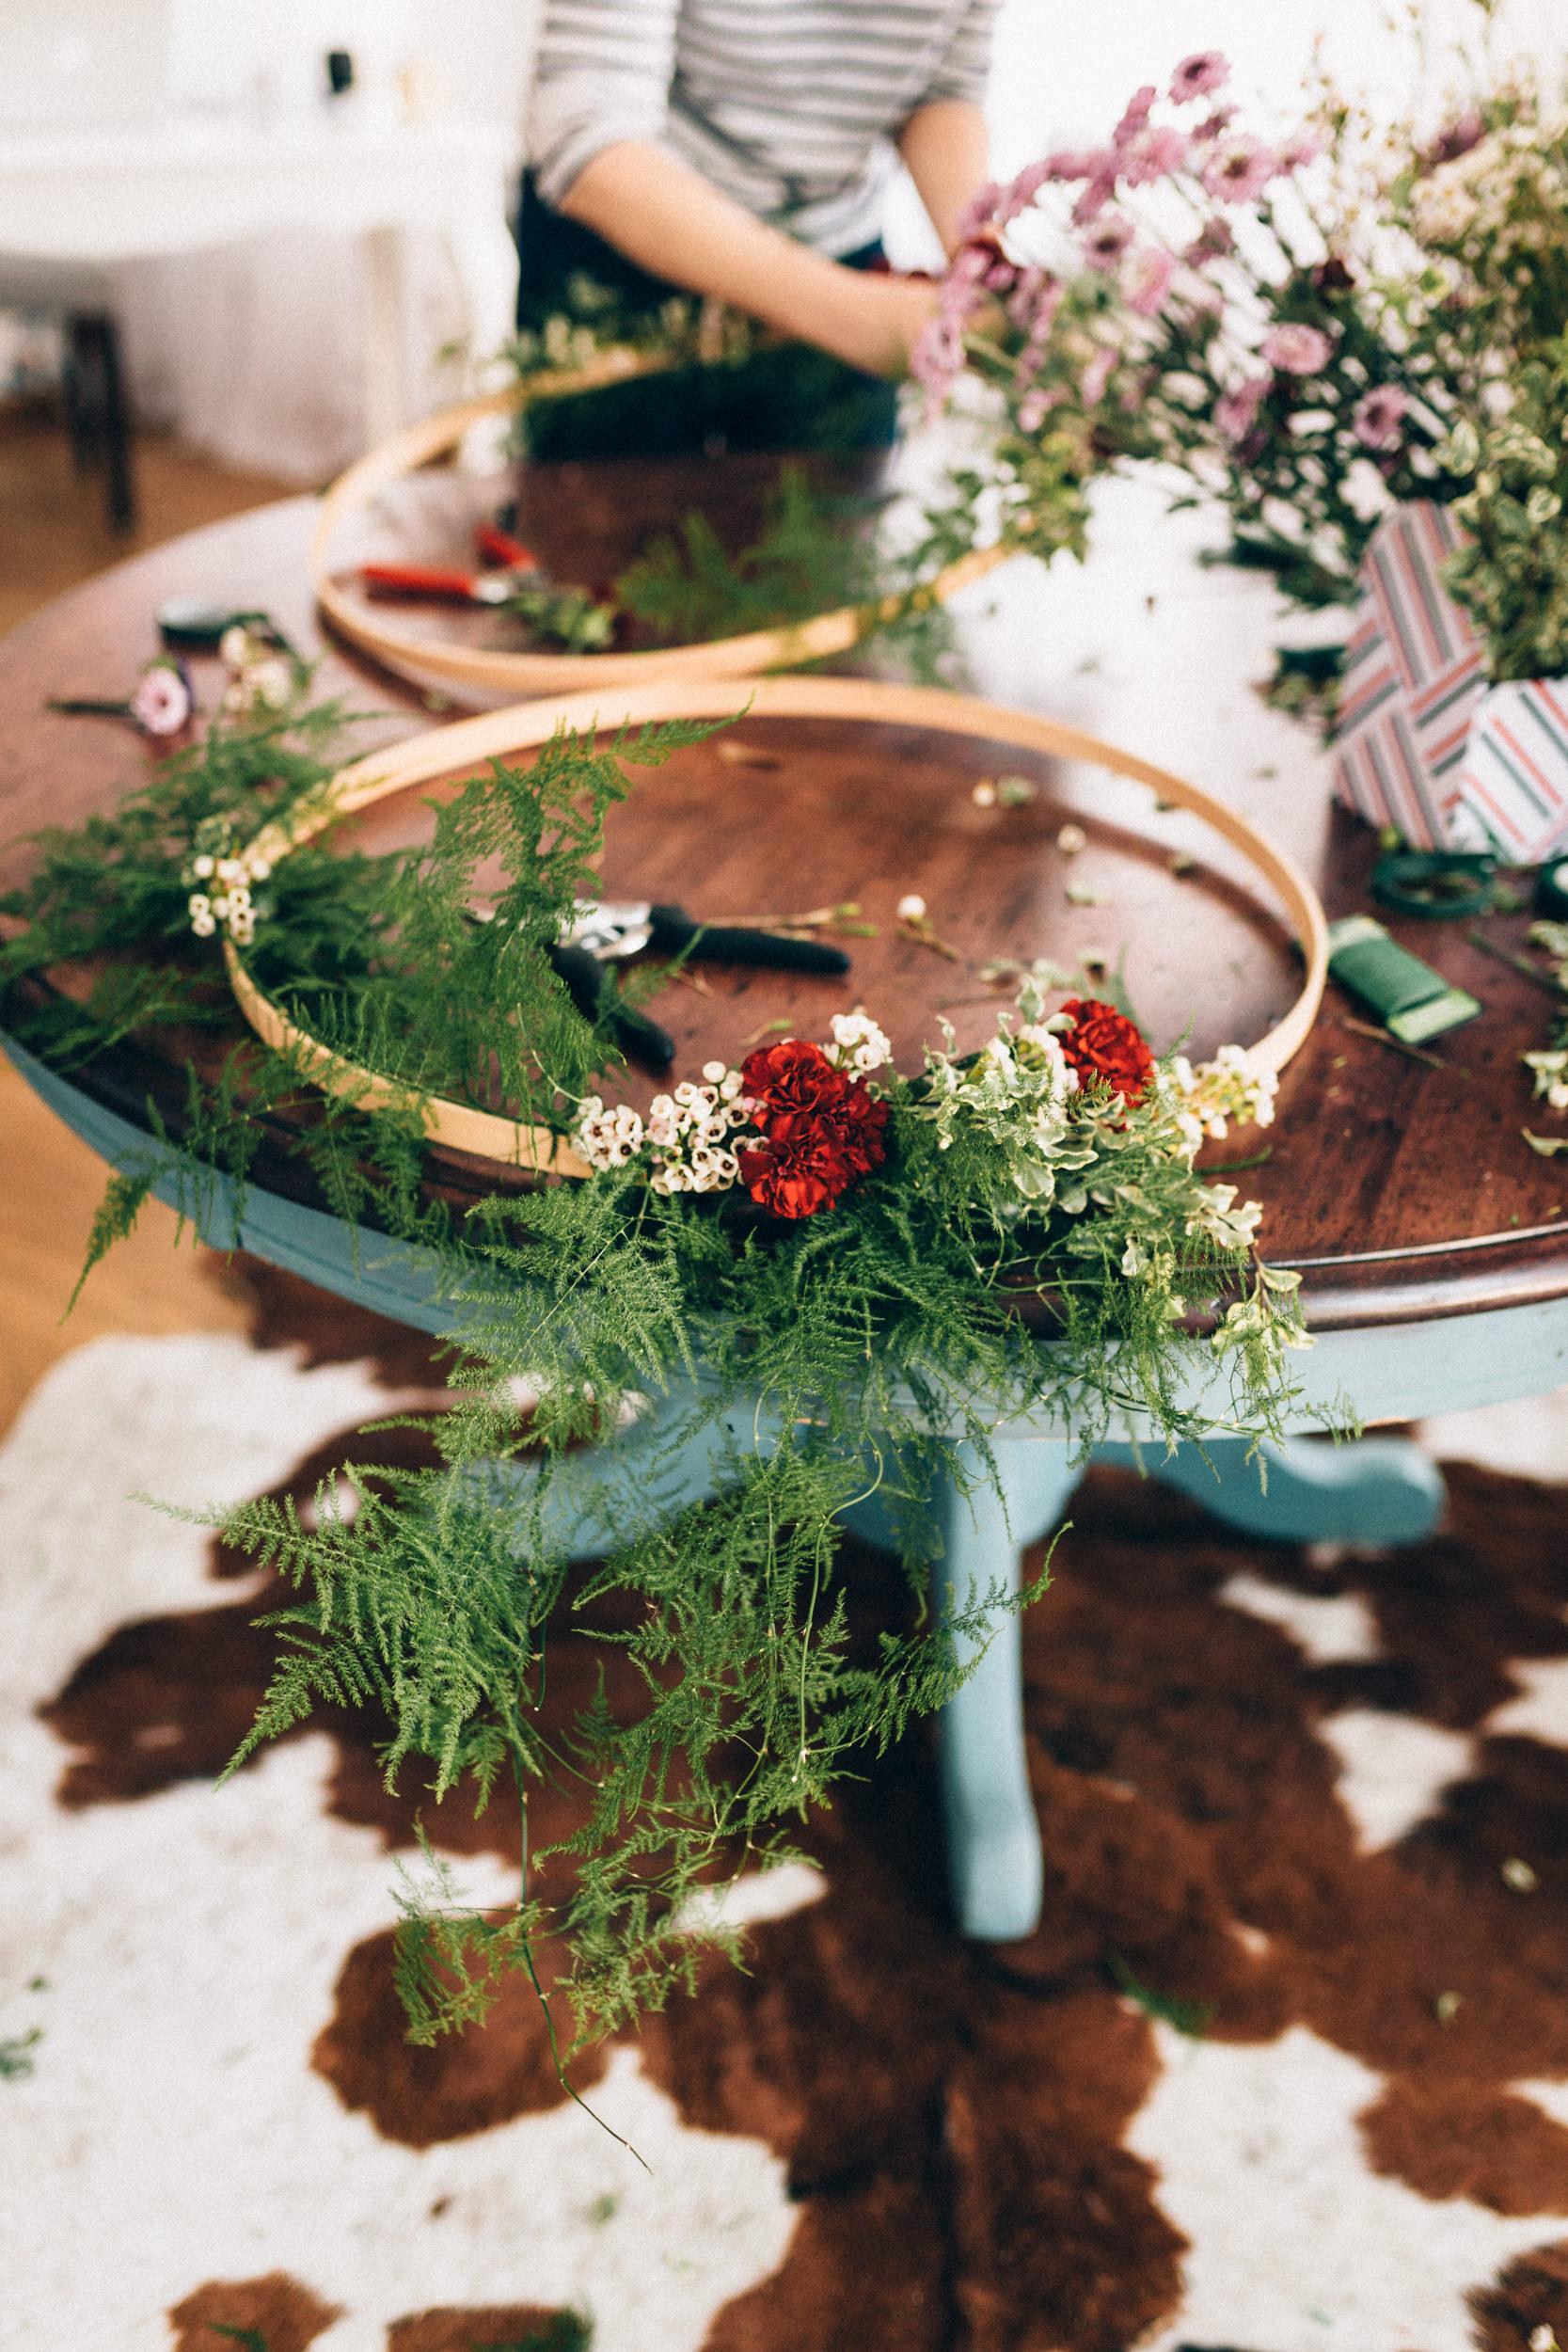 Hoop wreath on table